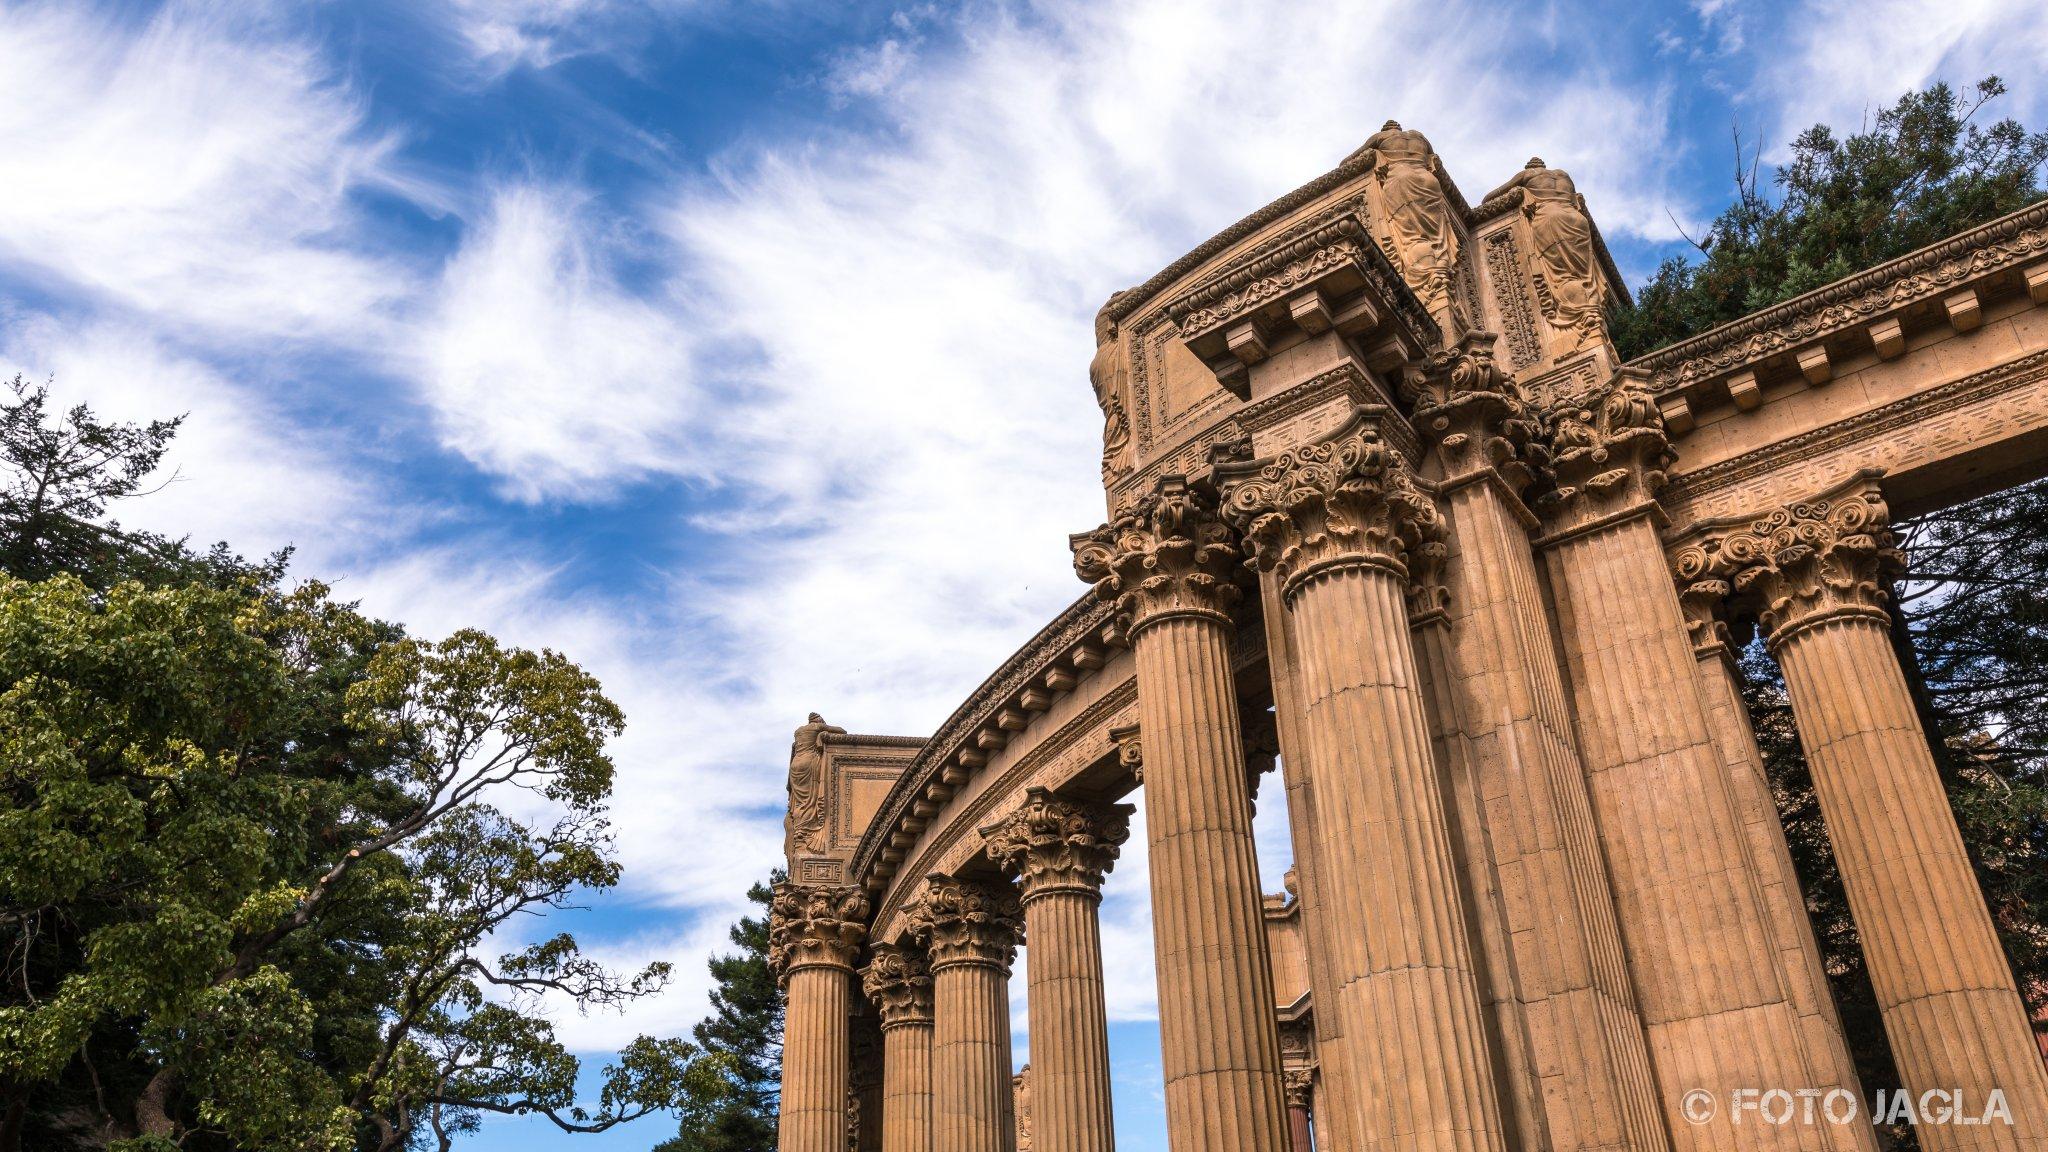 Kalifornien - September 2018 Palace of Fine Arts Museum San Francisco - Marina District